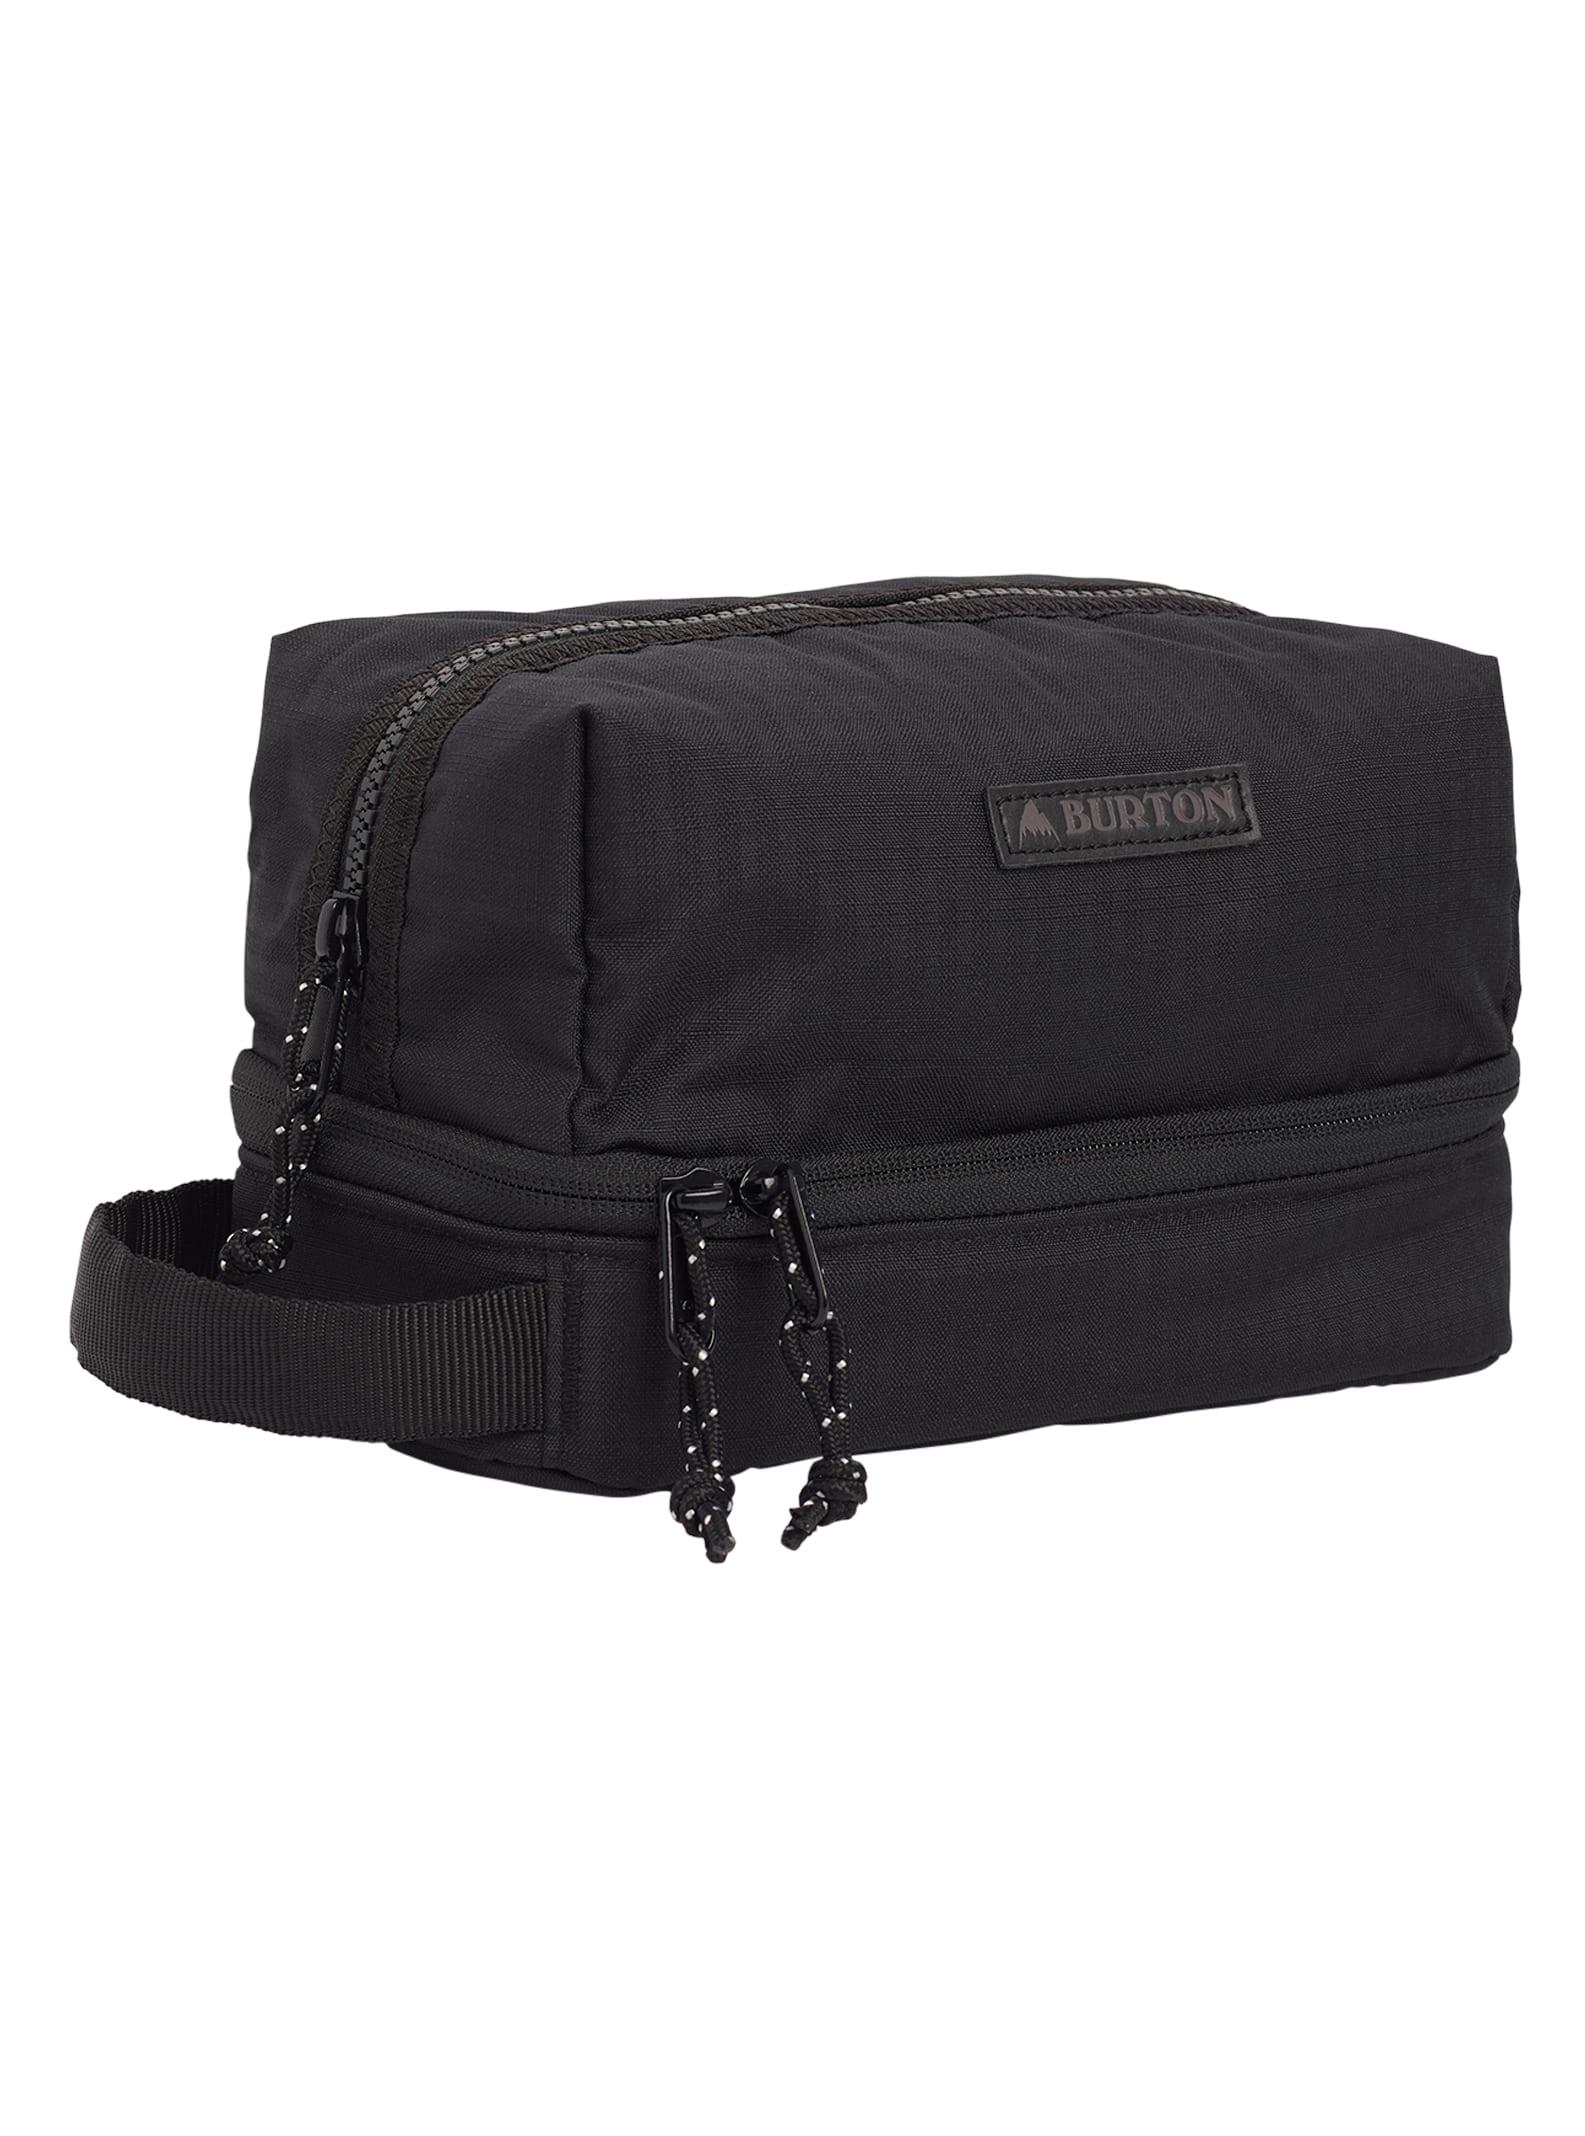 Burton Low Maintenance Kit 5L Accessory Bag, True Black Triple Ripstop